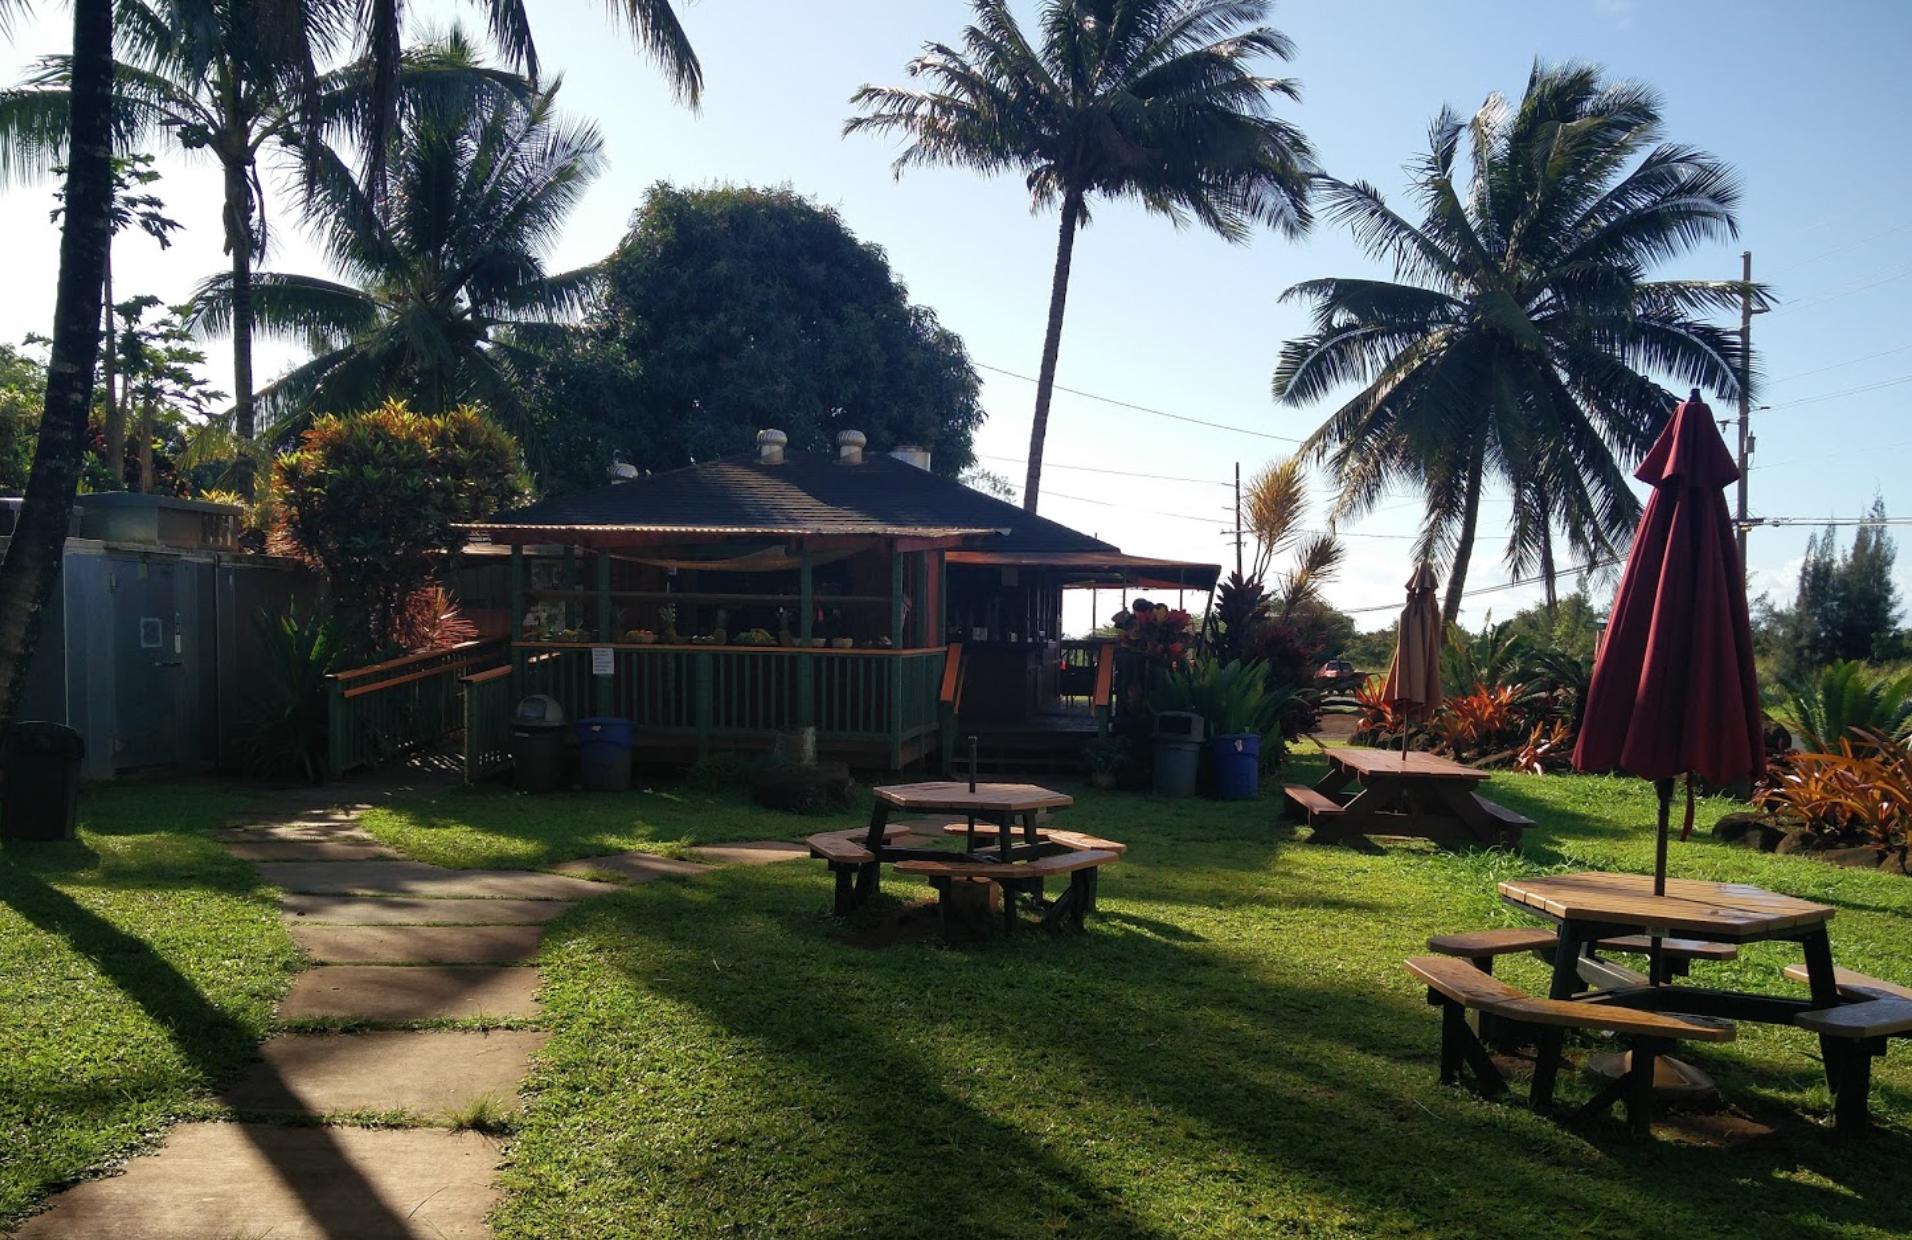 Photo 1: Moloaa Sunrise Fruit stand